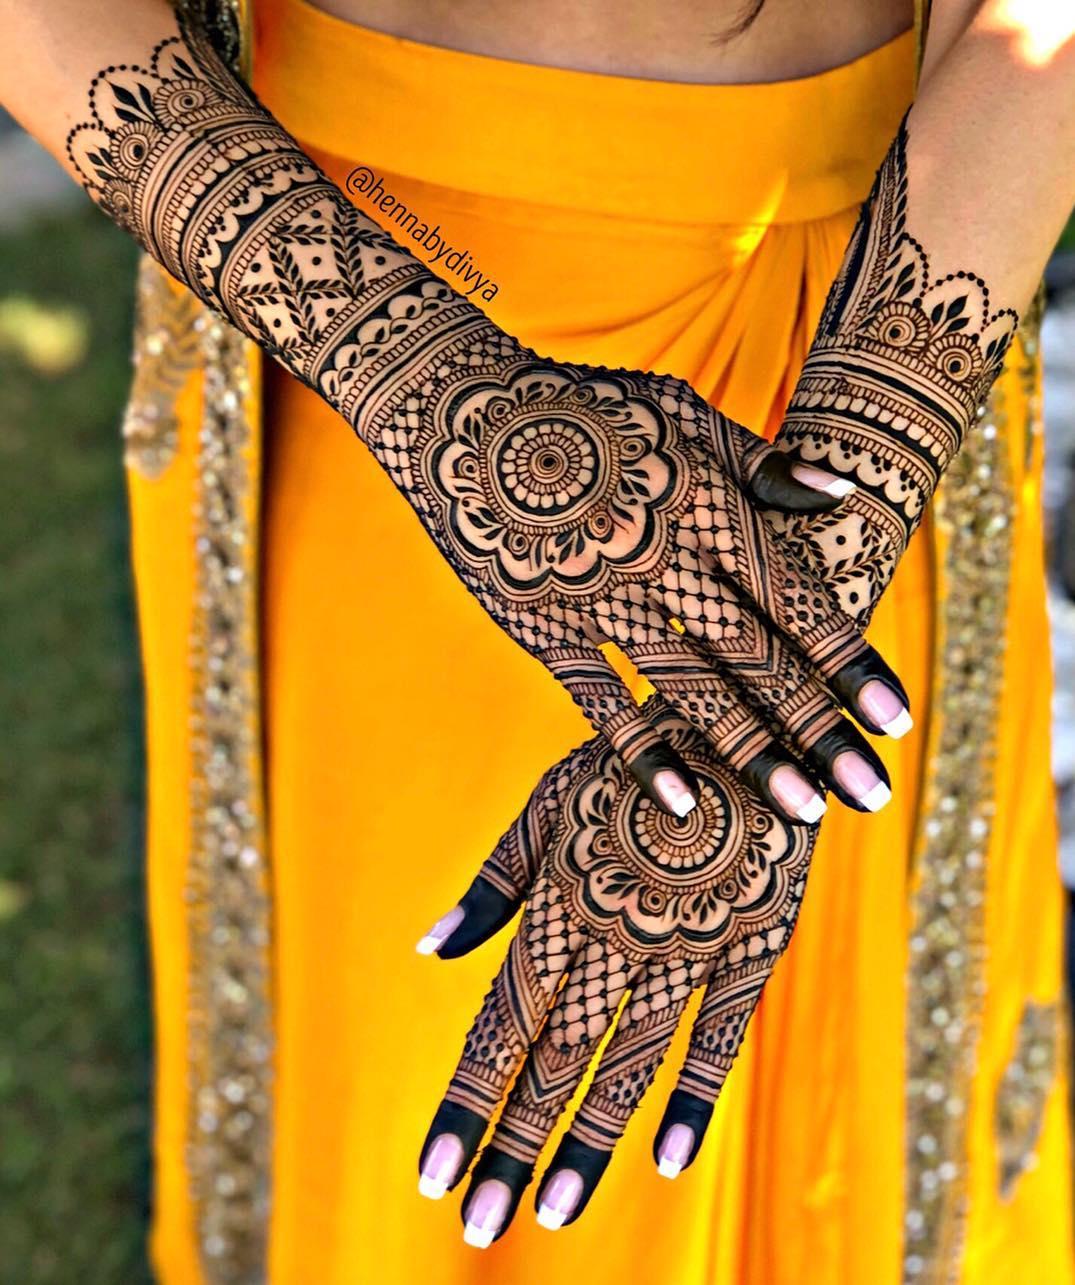 PunjabKesari, इंडियन मेहंदी डिज़ाइन इमेज, Indian Bridal Mehndi DesignFor BackHand, इंडियन मेहंदी डिजाइन फॉर बैक हैंड